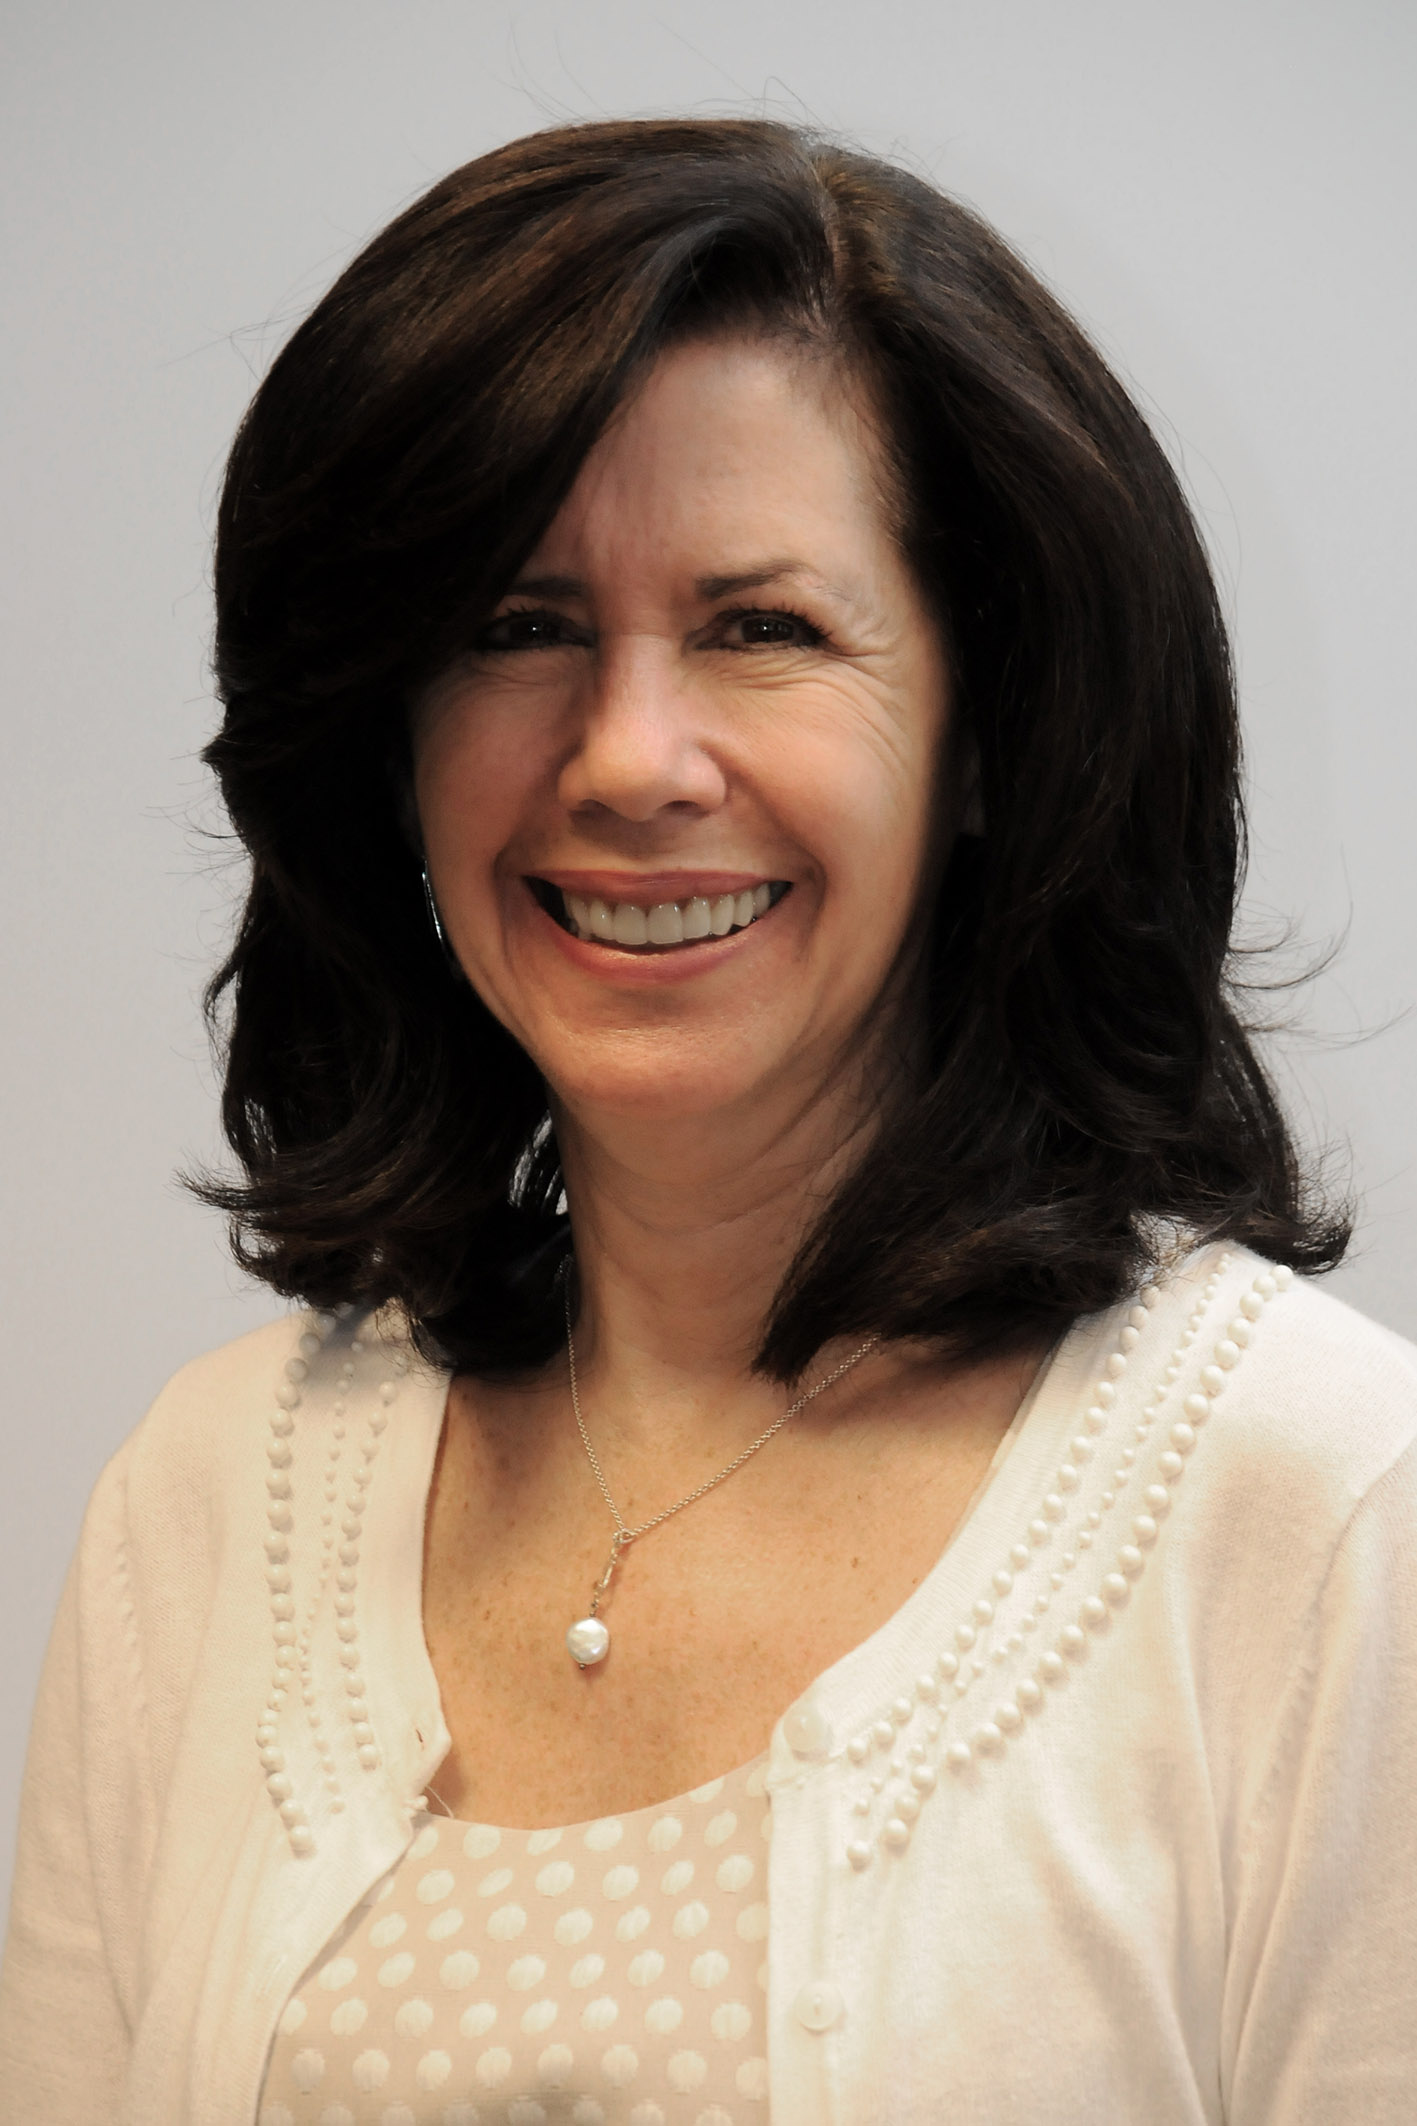 GM Vice President, Global Quality, Grace Lieblein